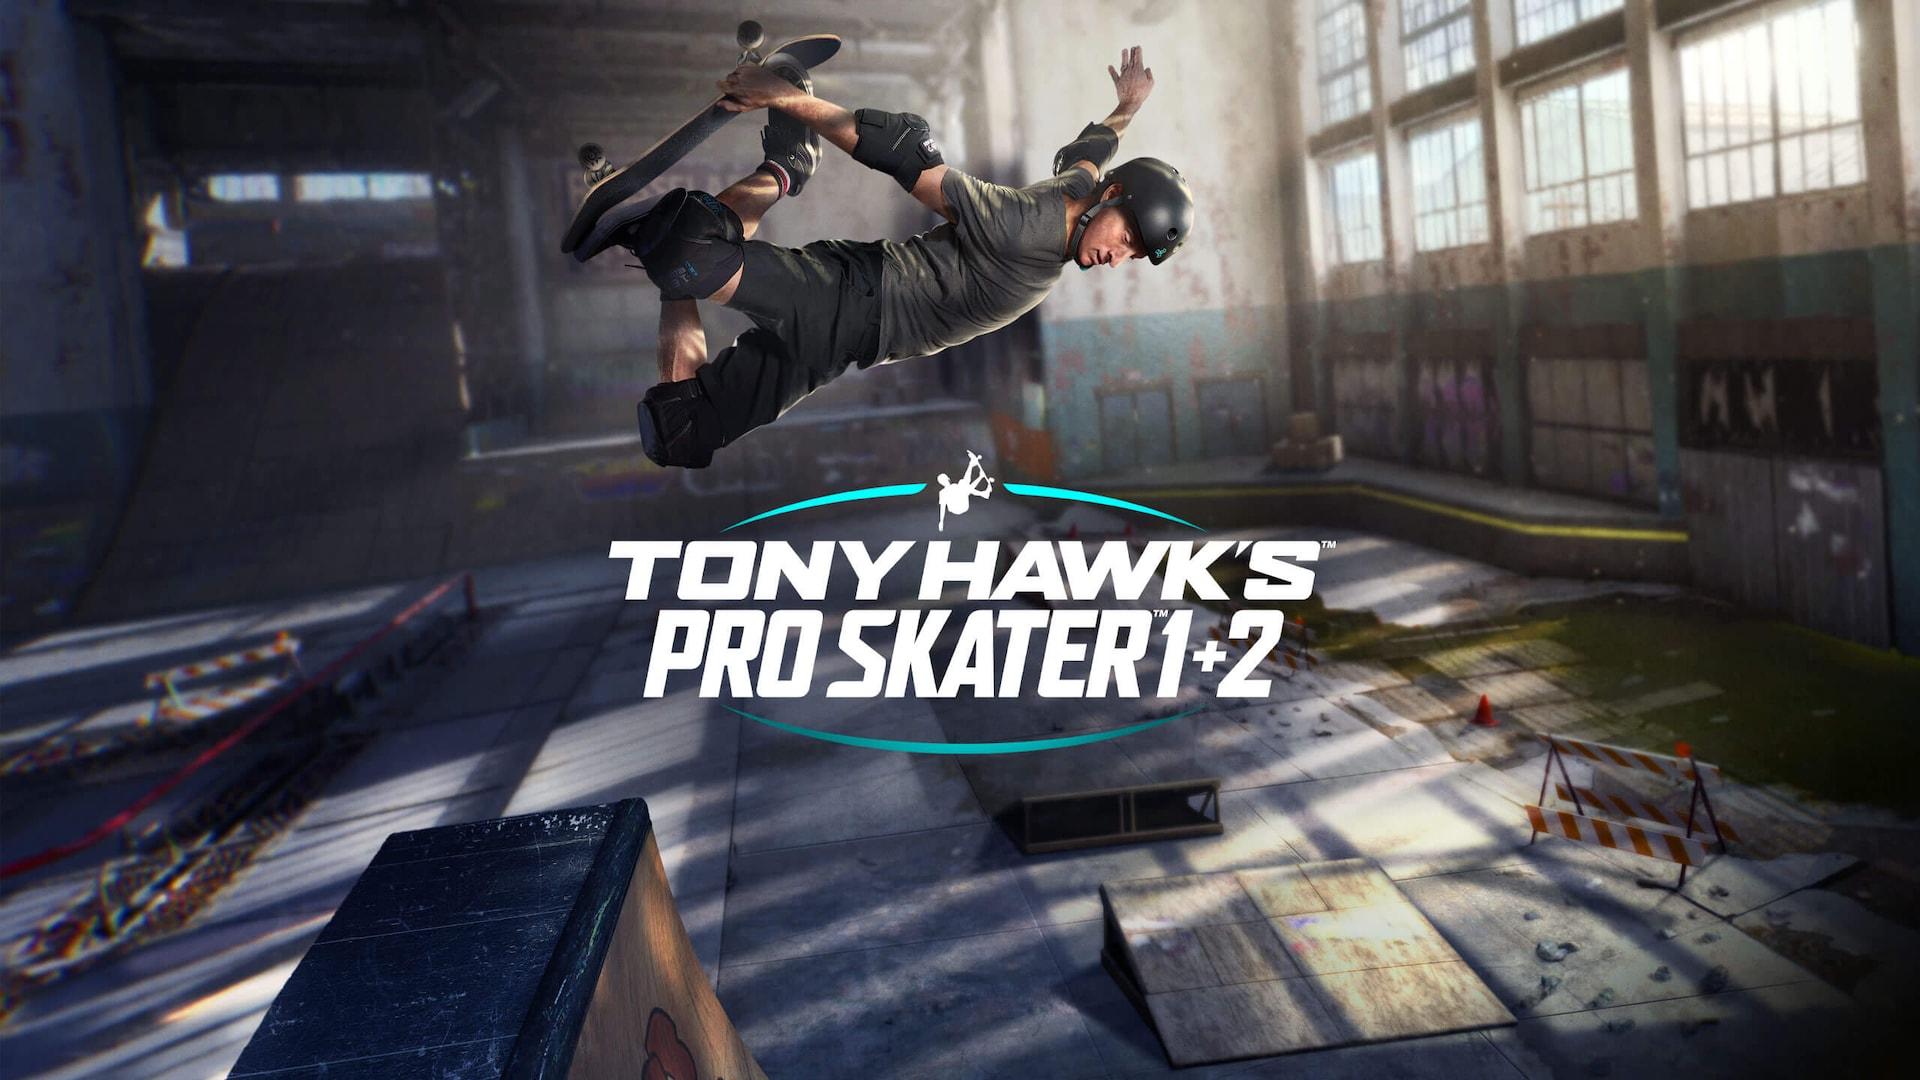 Tony Hawk's Pro Skater 1 + 2 - Recensione